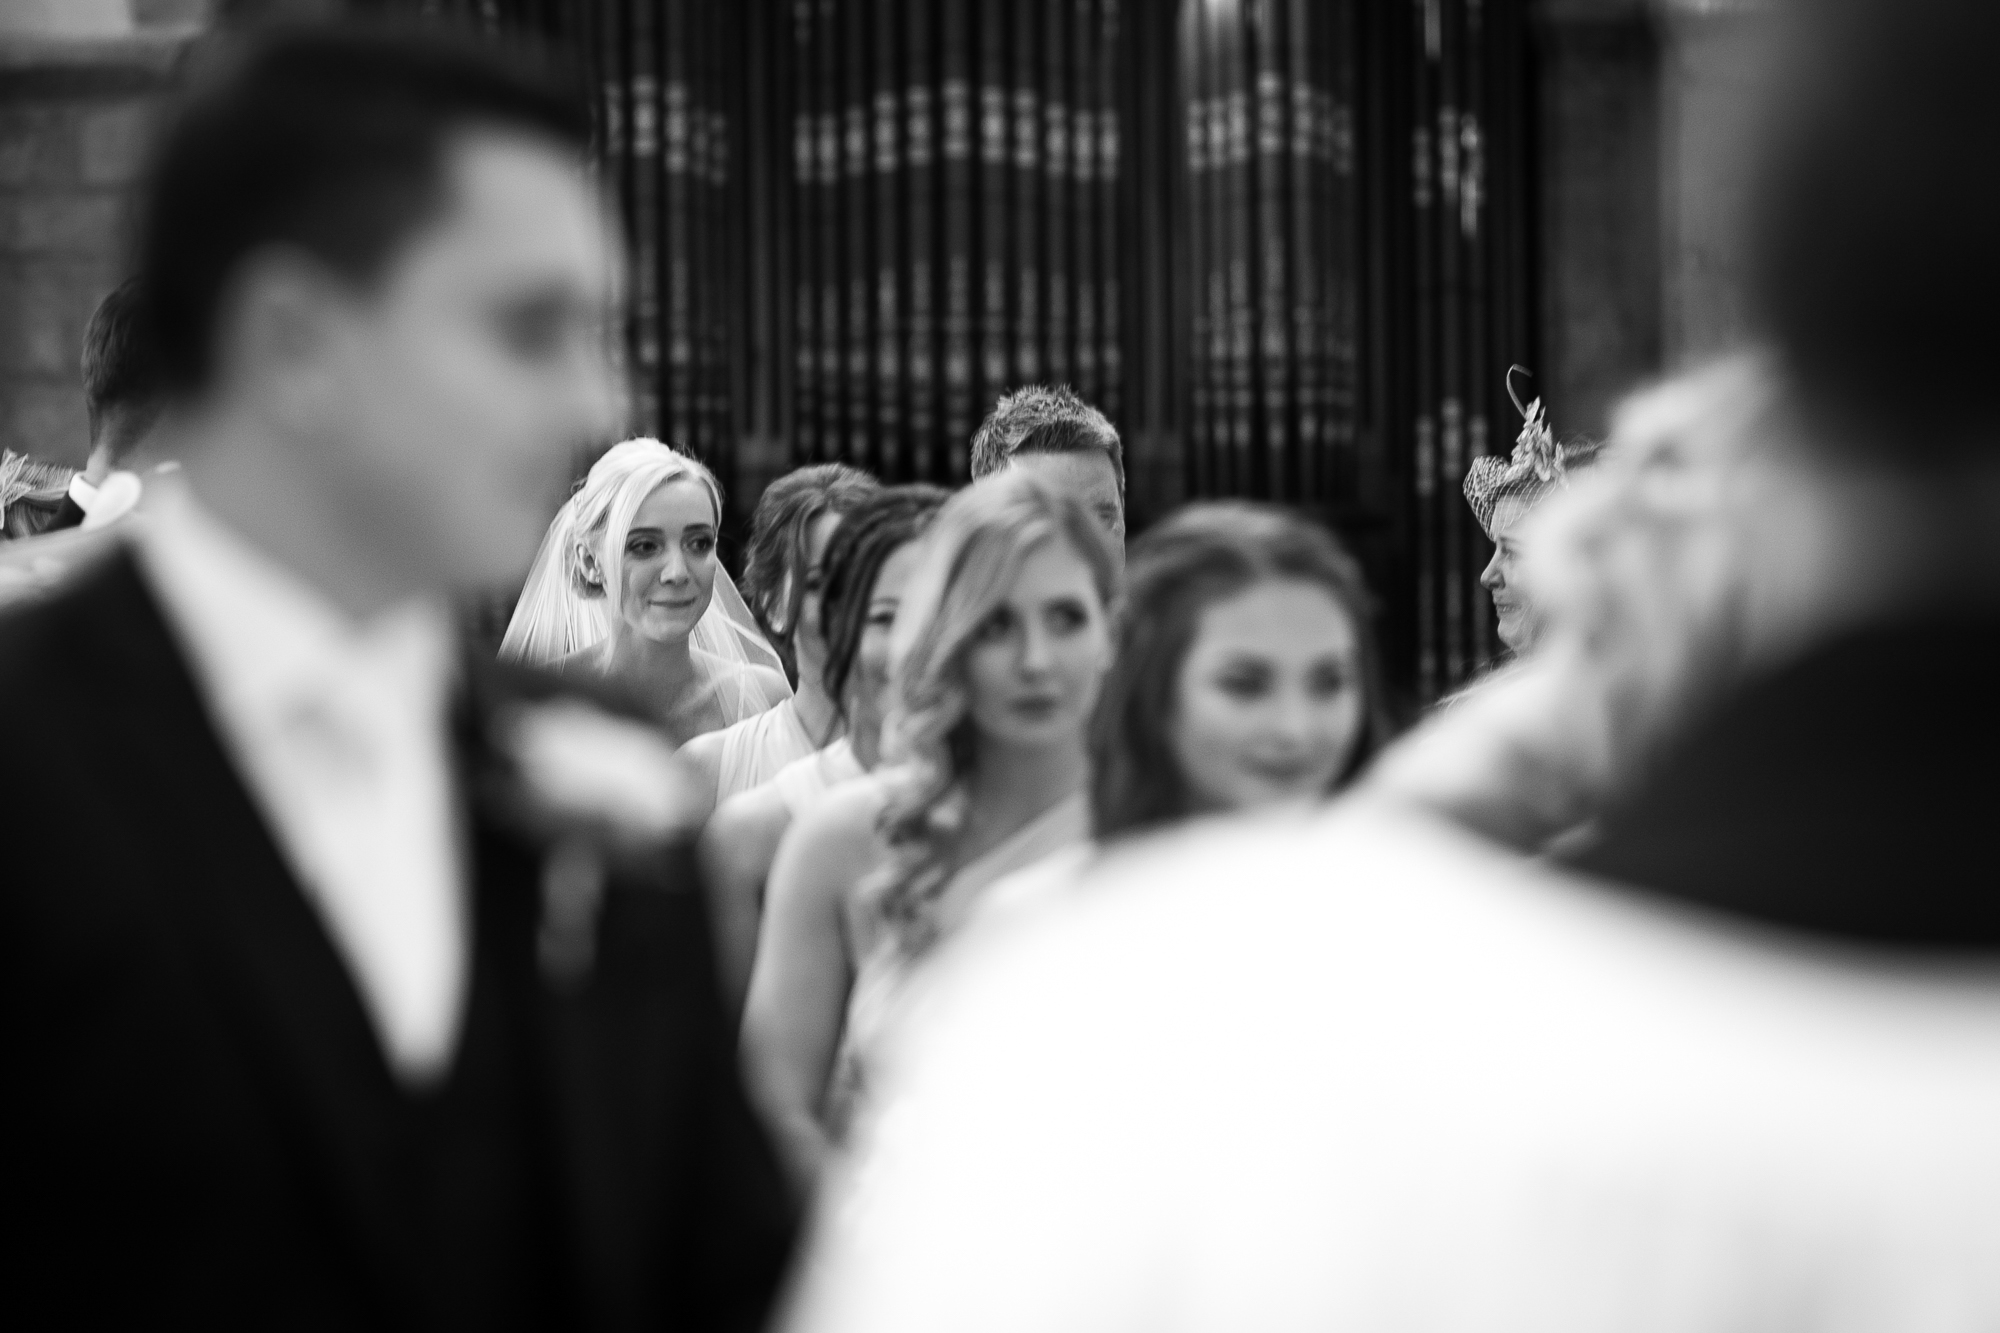 Headlam hall wedding photographer-22.jpg